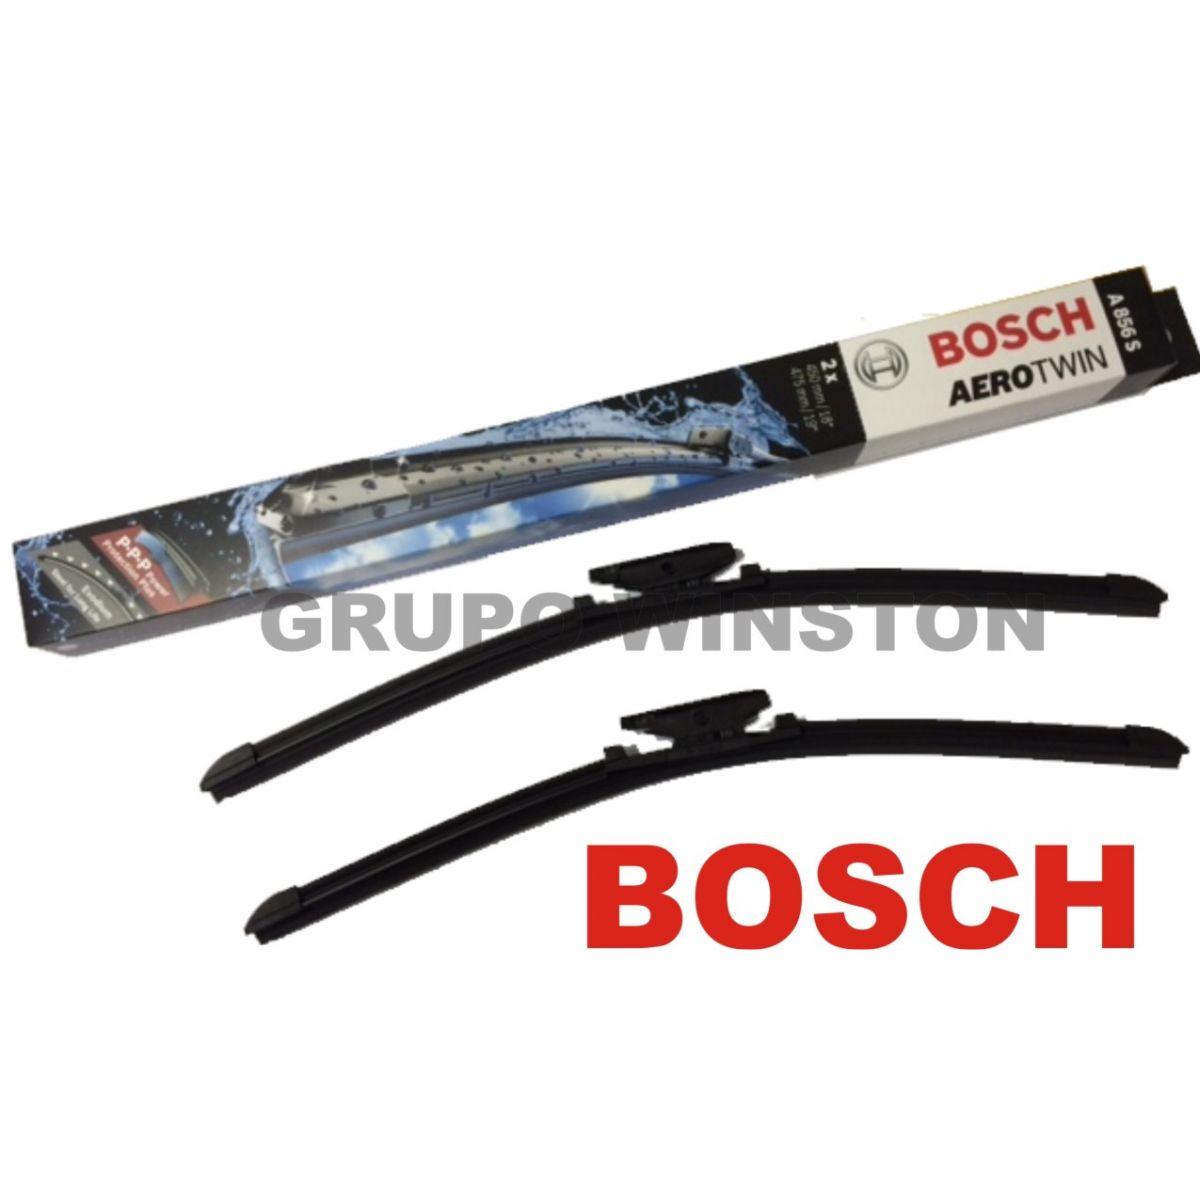 Palheta Bosch Aerotwin Mini Cooper ENCAIXE BAIONETA 18/19 A856s